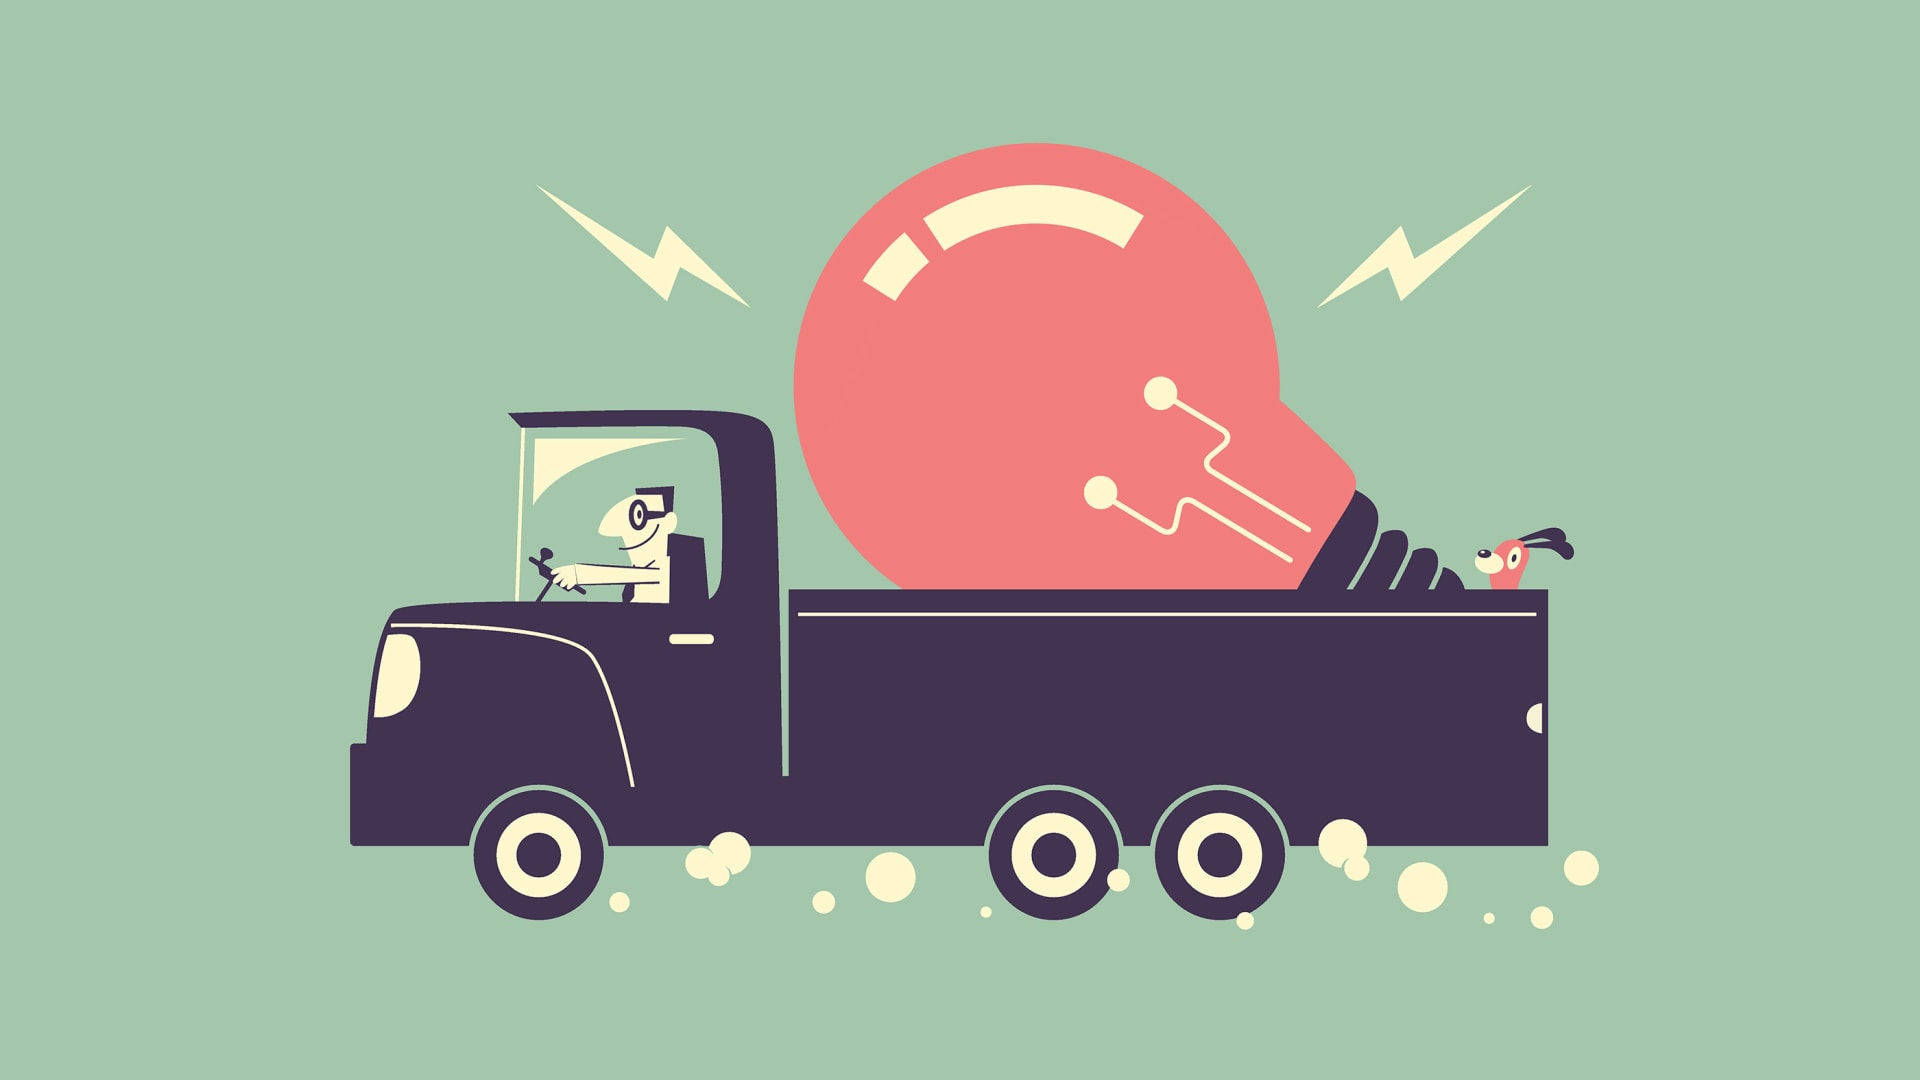 3 Ways to Turn Your Big Idea Into Big Revenue